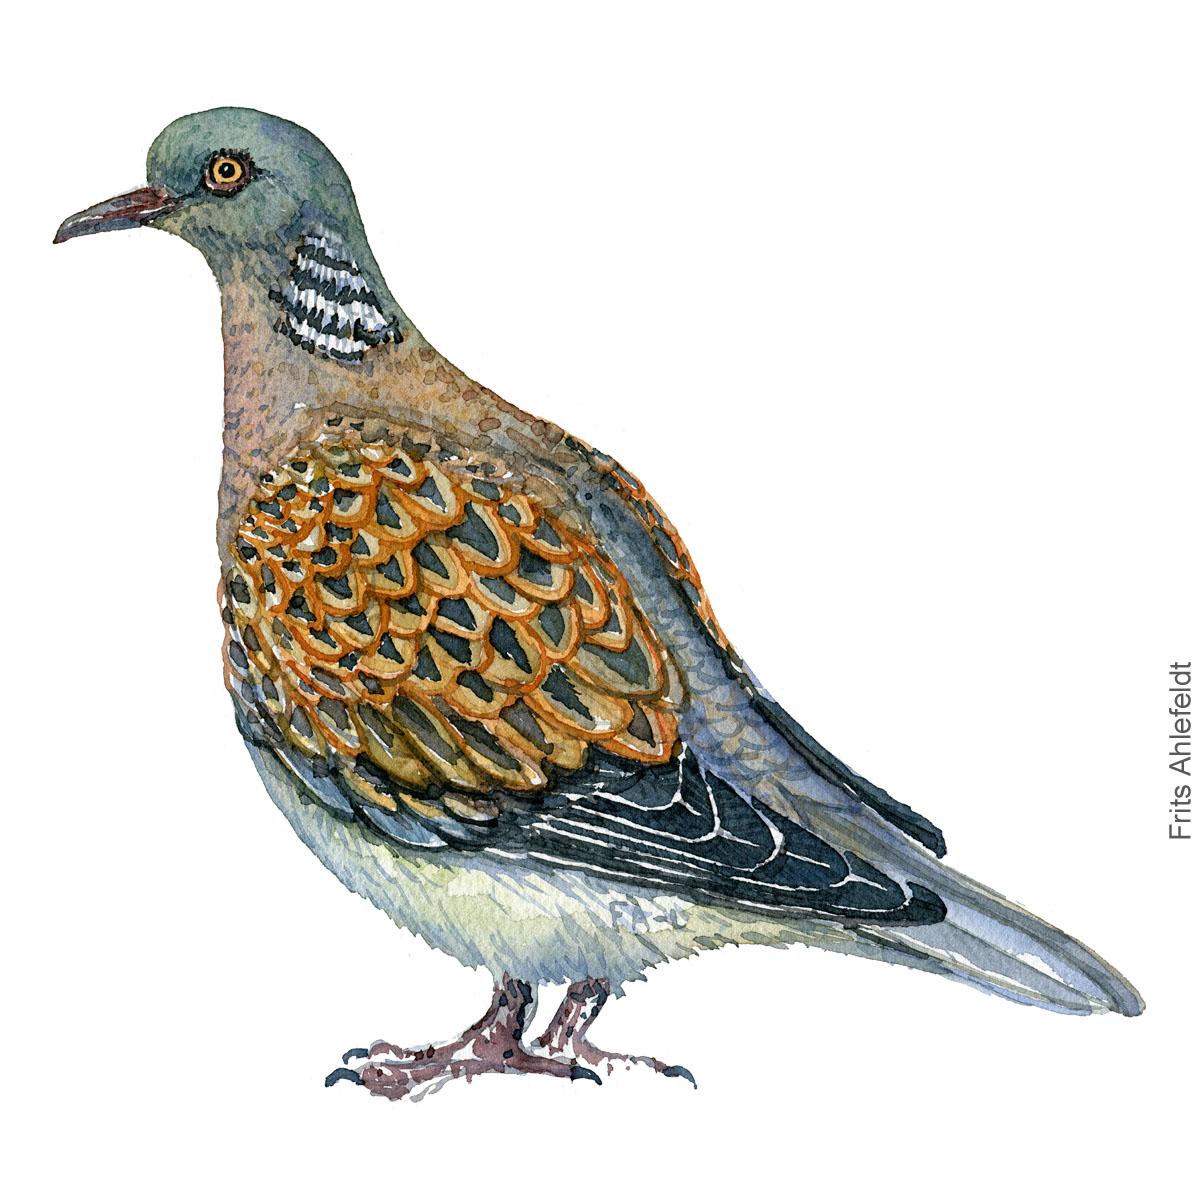 European turtledove, Turteldue akvarel. Watercolor painting by Frits Ahlefeldt